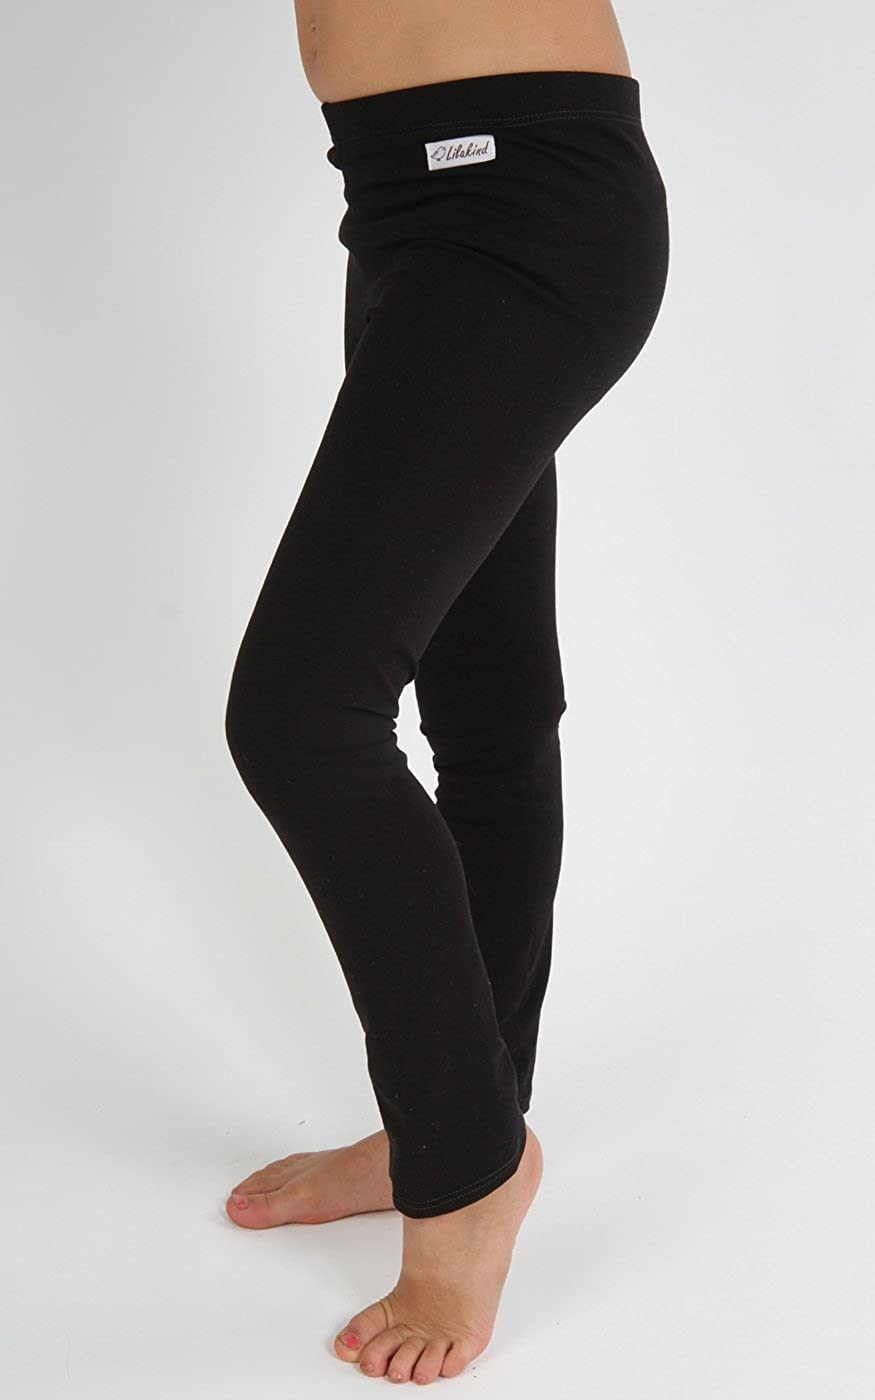 "Lilakind/"" Leggins Hose Babyhose Kinderhose Stretchhose Jersey Made in Germany"